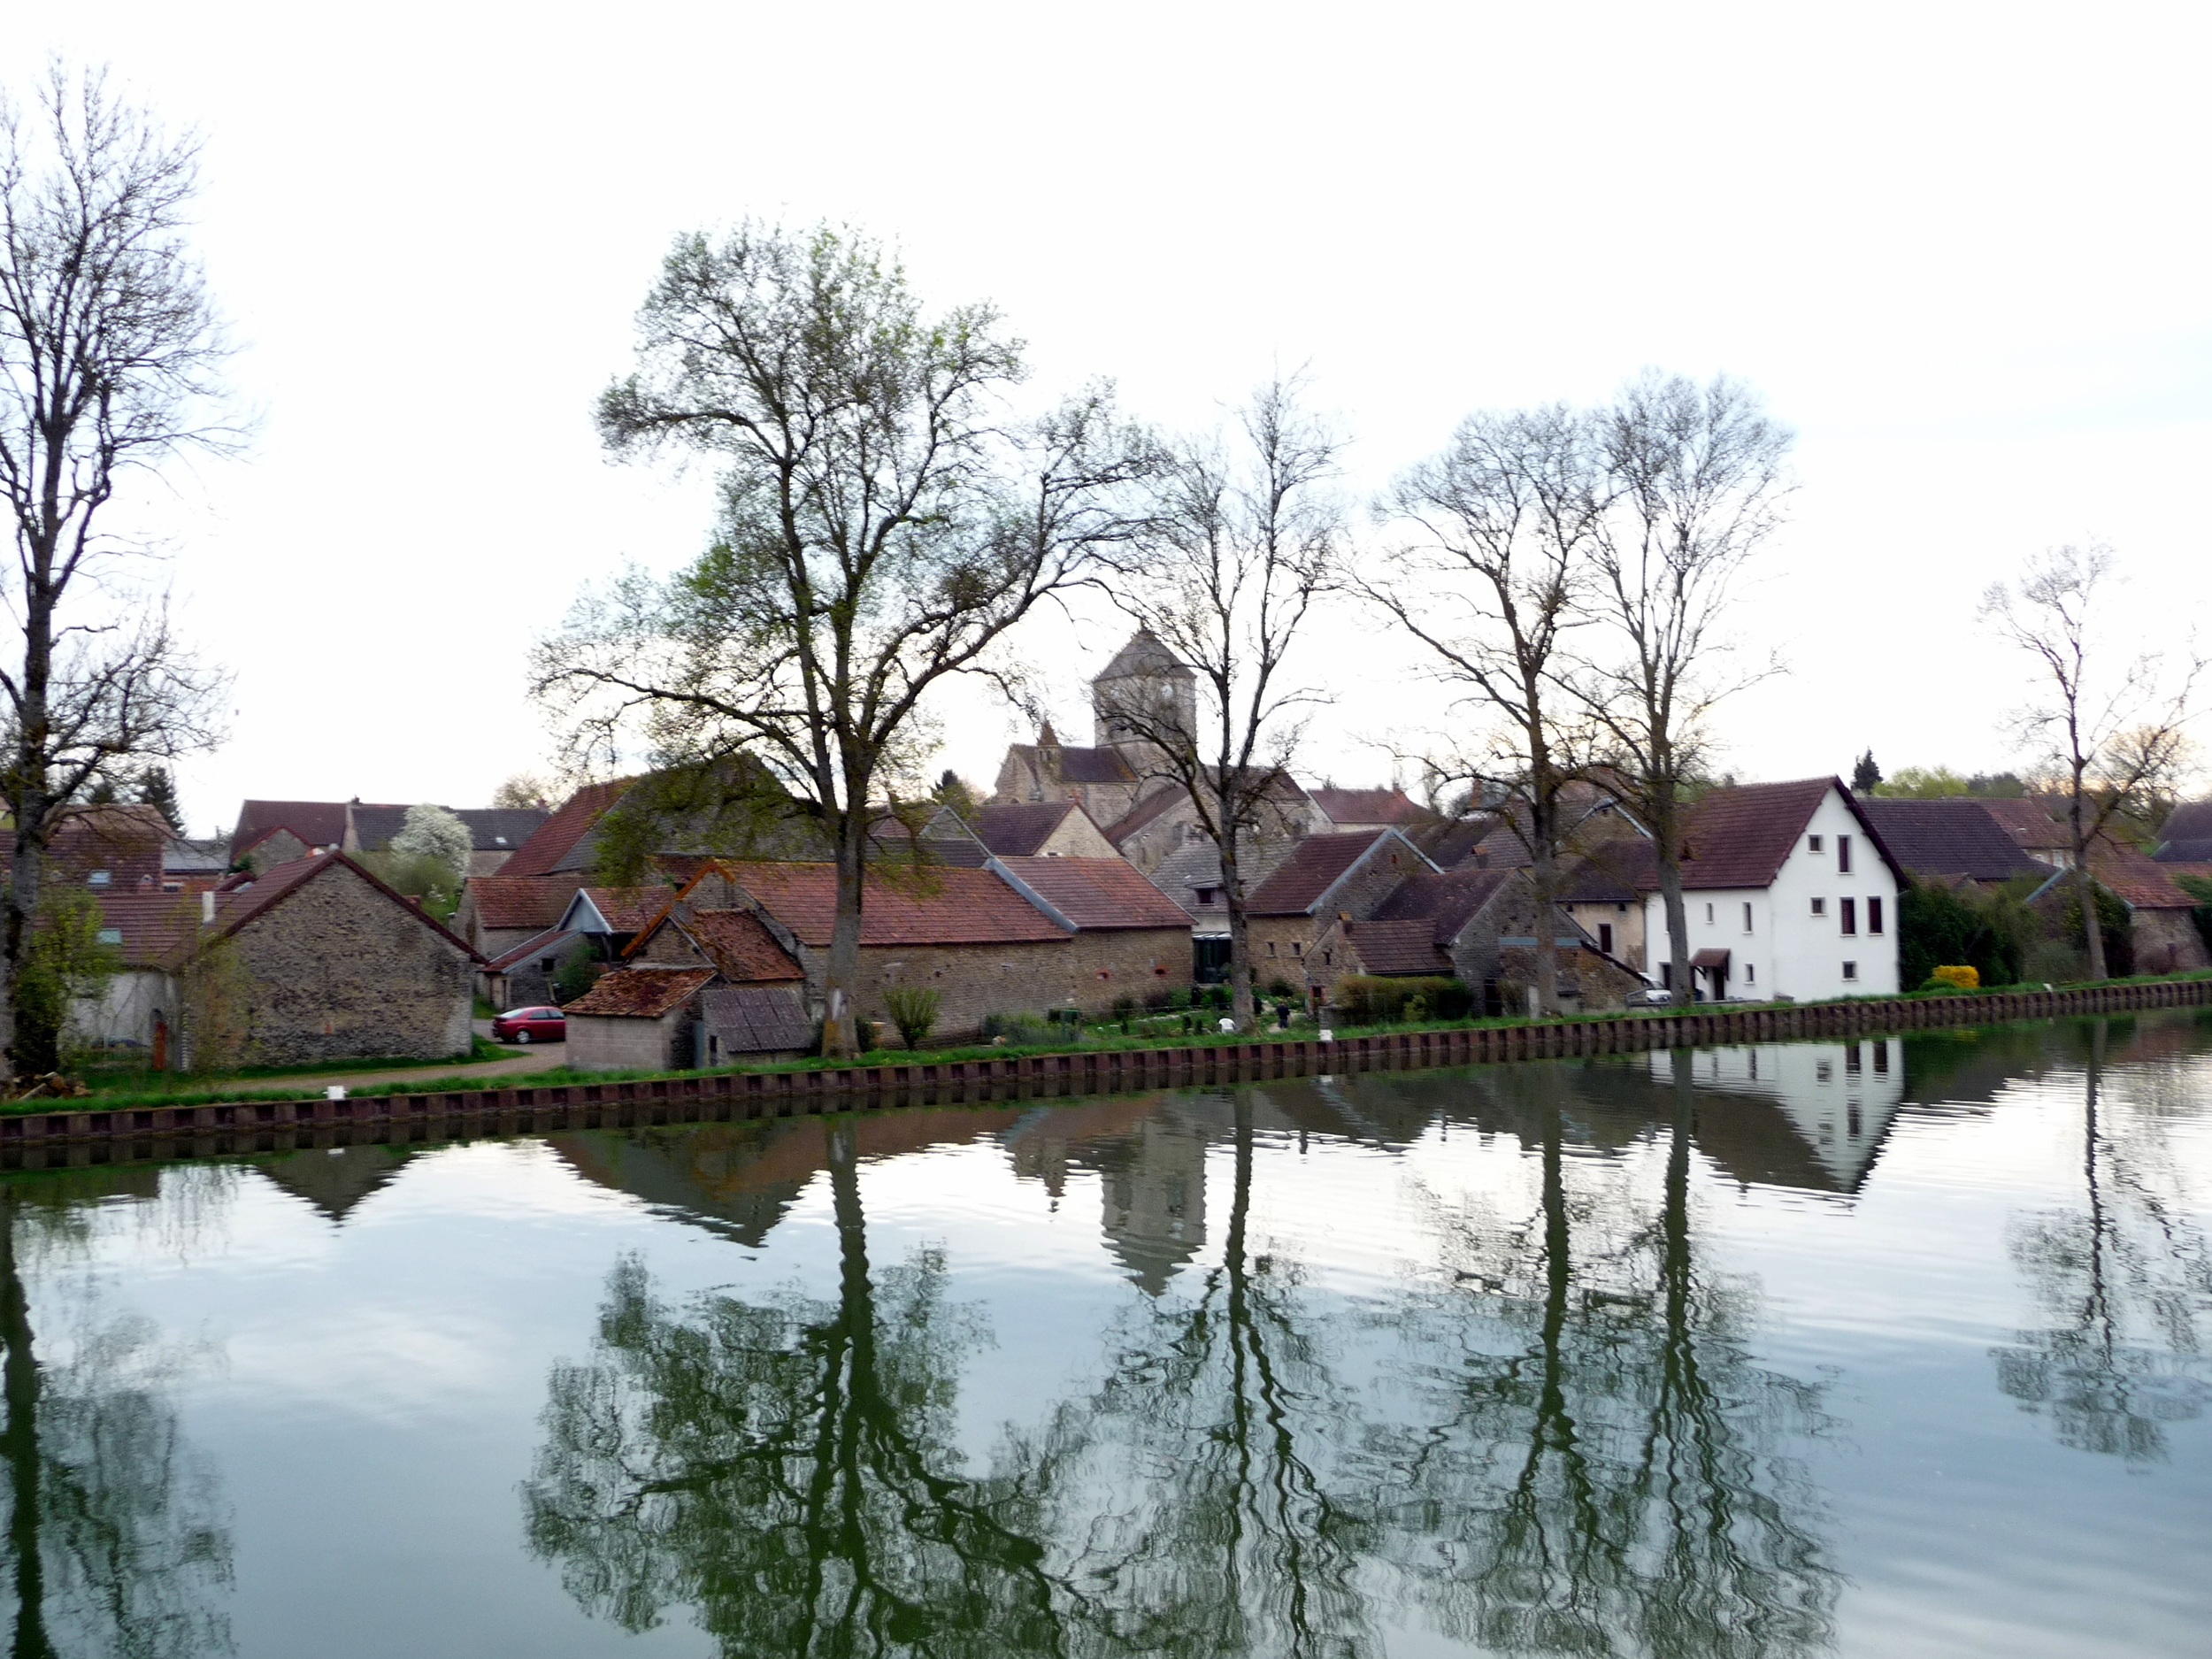 The Burgundy Canal at dusk